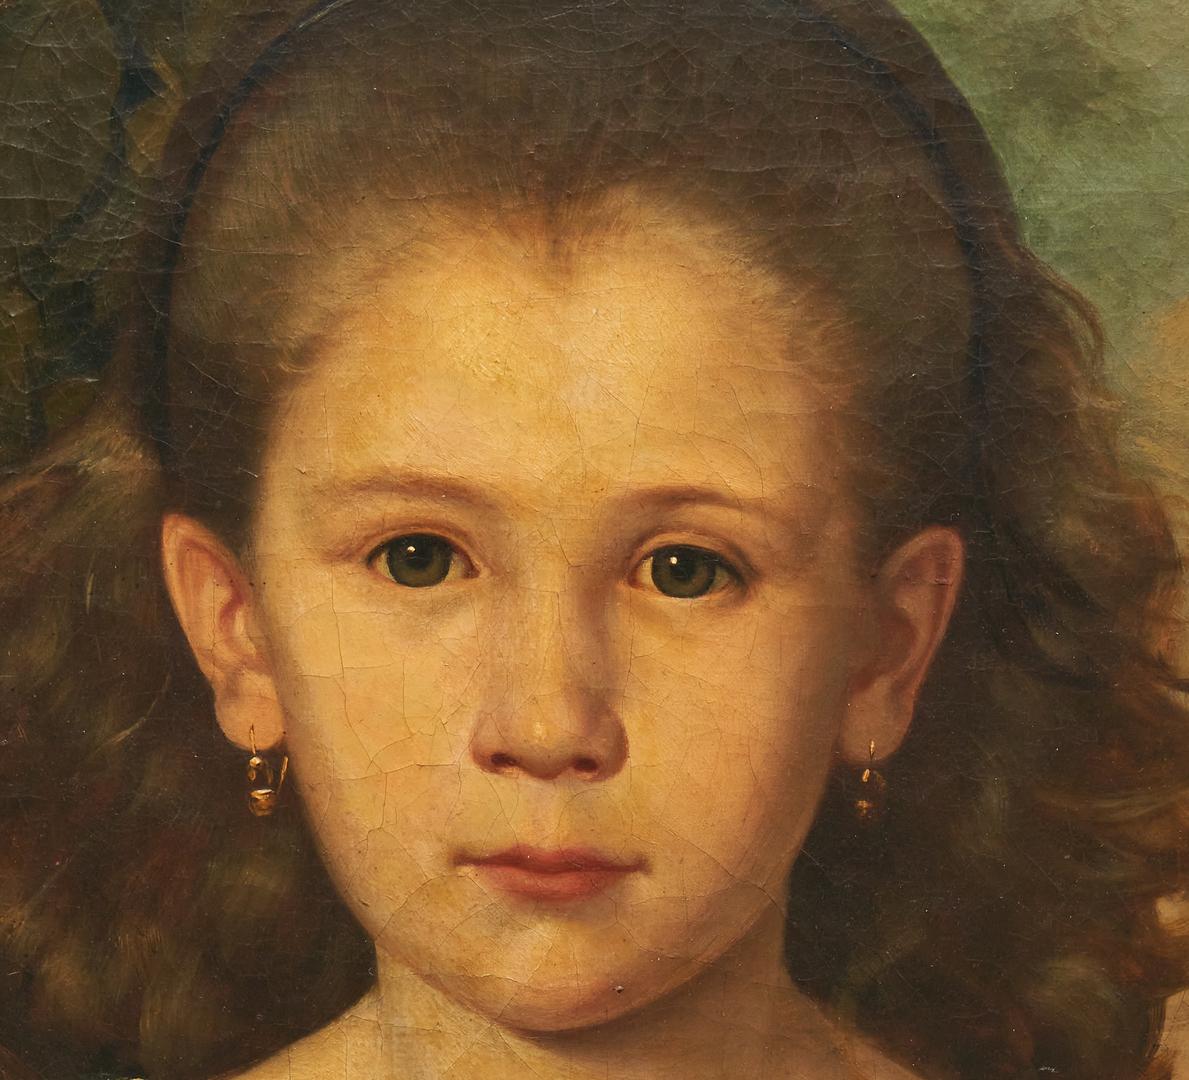 Lot 138: Signed European School O/C Portrait of a Little Girl, poss. Jozef Budzynski